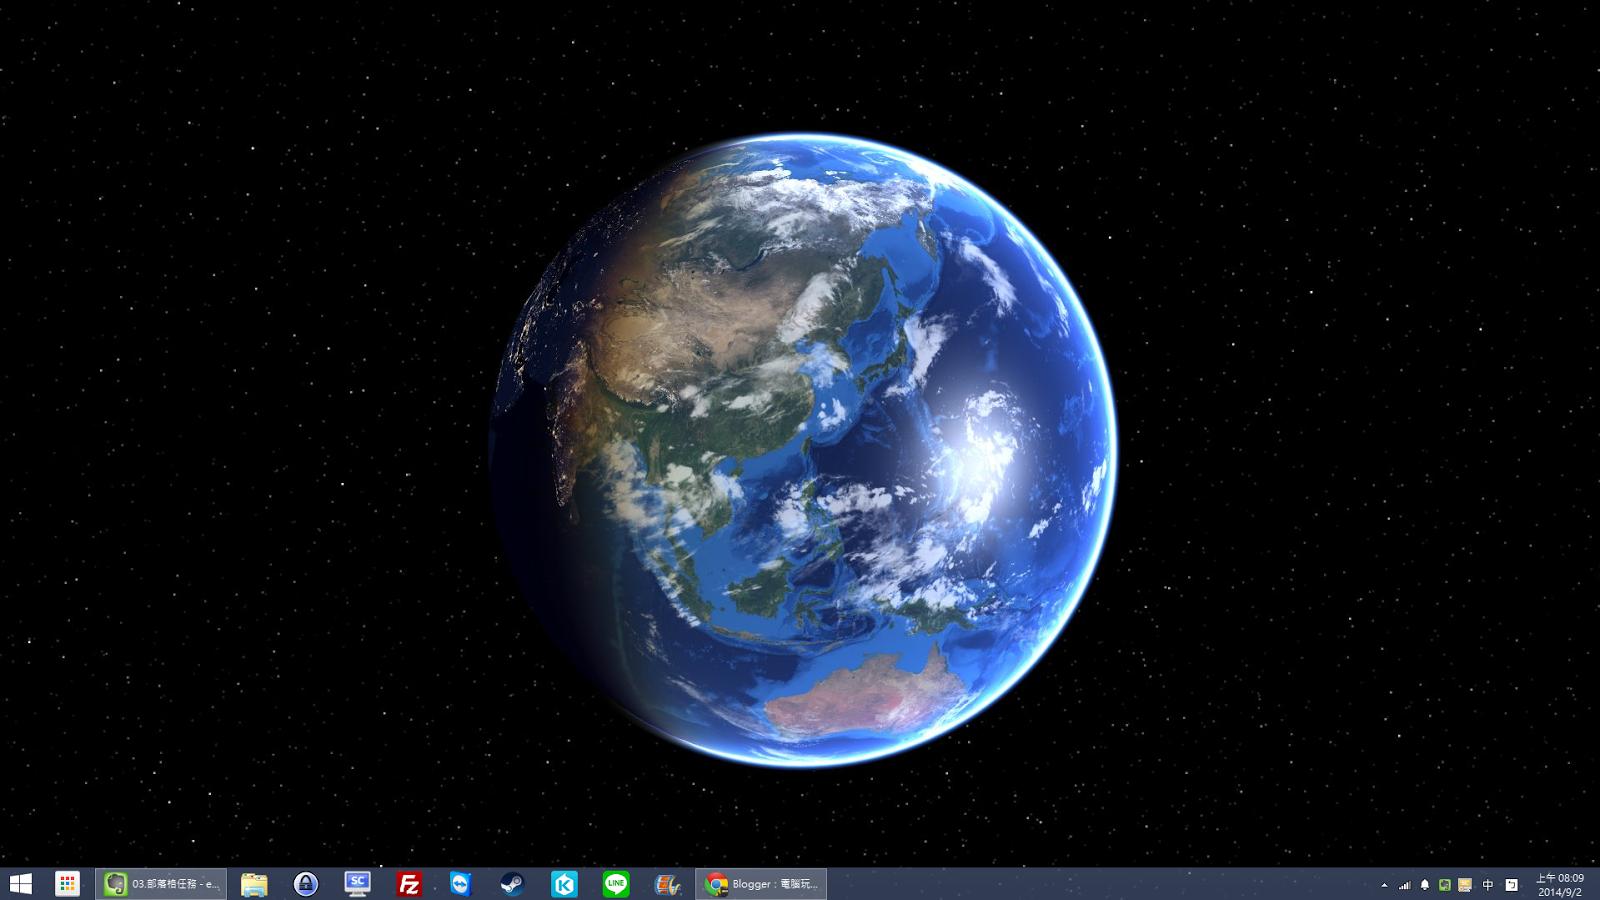 Google Desktop Wallpaper Hd Desktopearth 3 從工作桌面打開宇宙之窗眺望地球變化